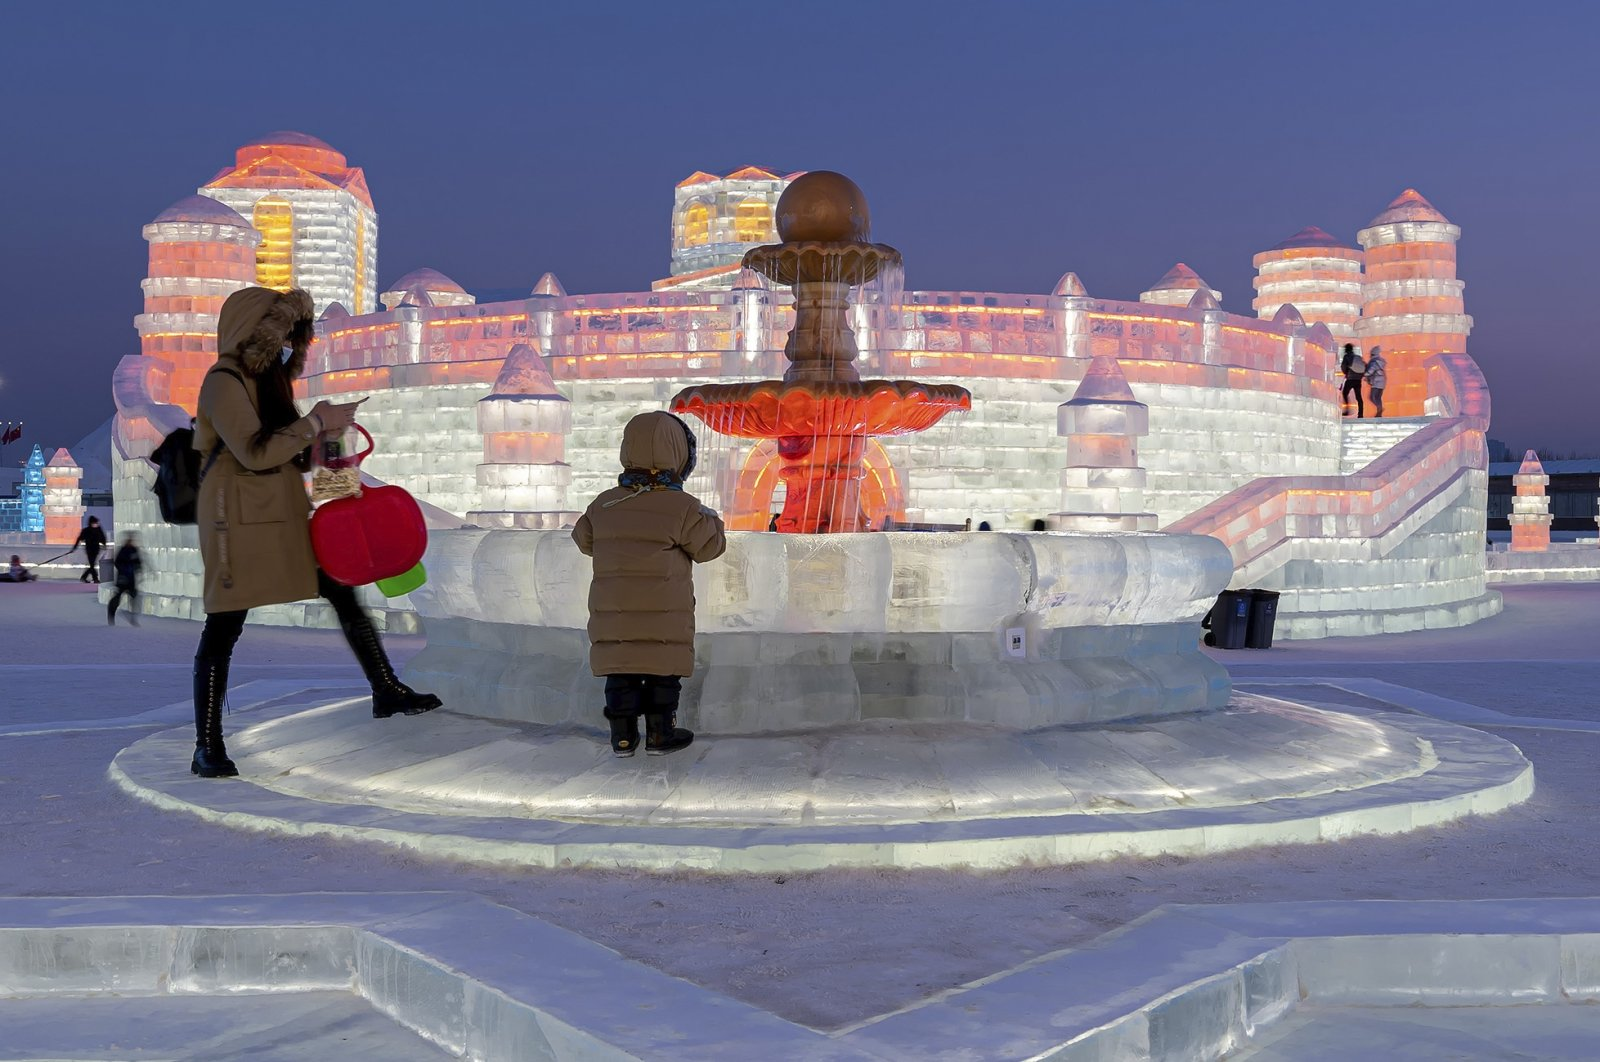 Visitors tour the annual Harbin Ice and Snow World in Harbin, Heilongjiang province, northeastern China, Jan. 5, 2021. (Chinatopix via AP)